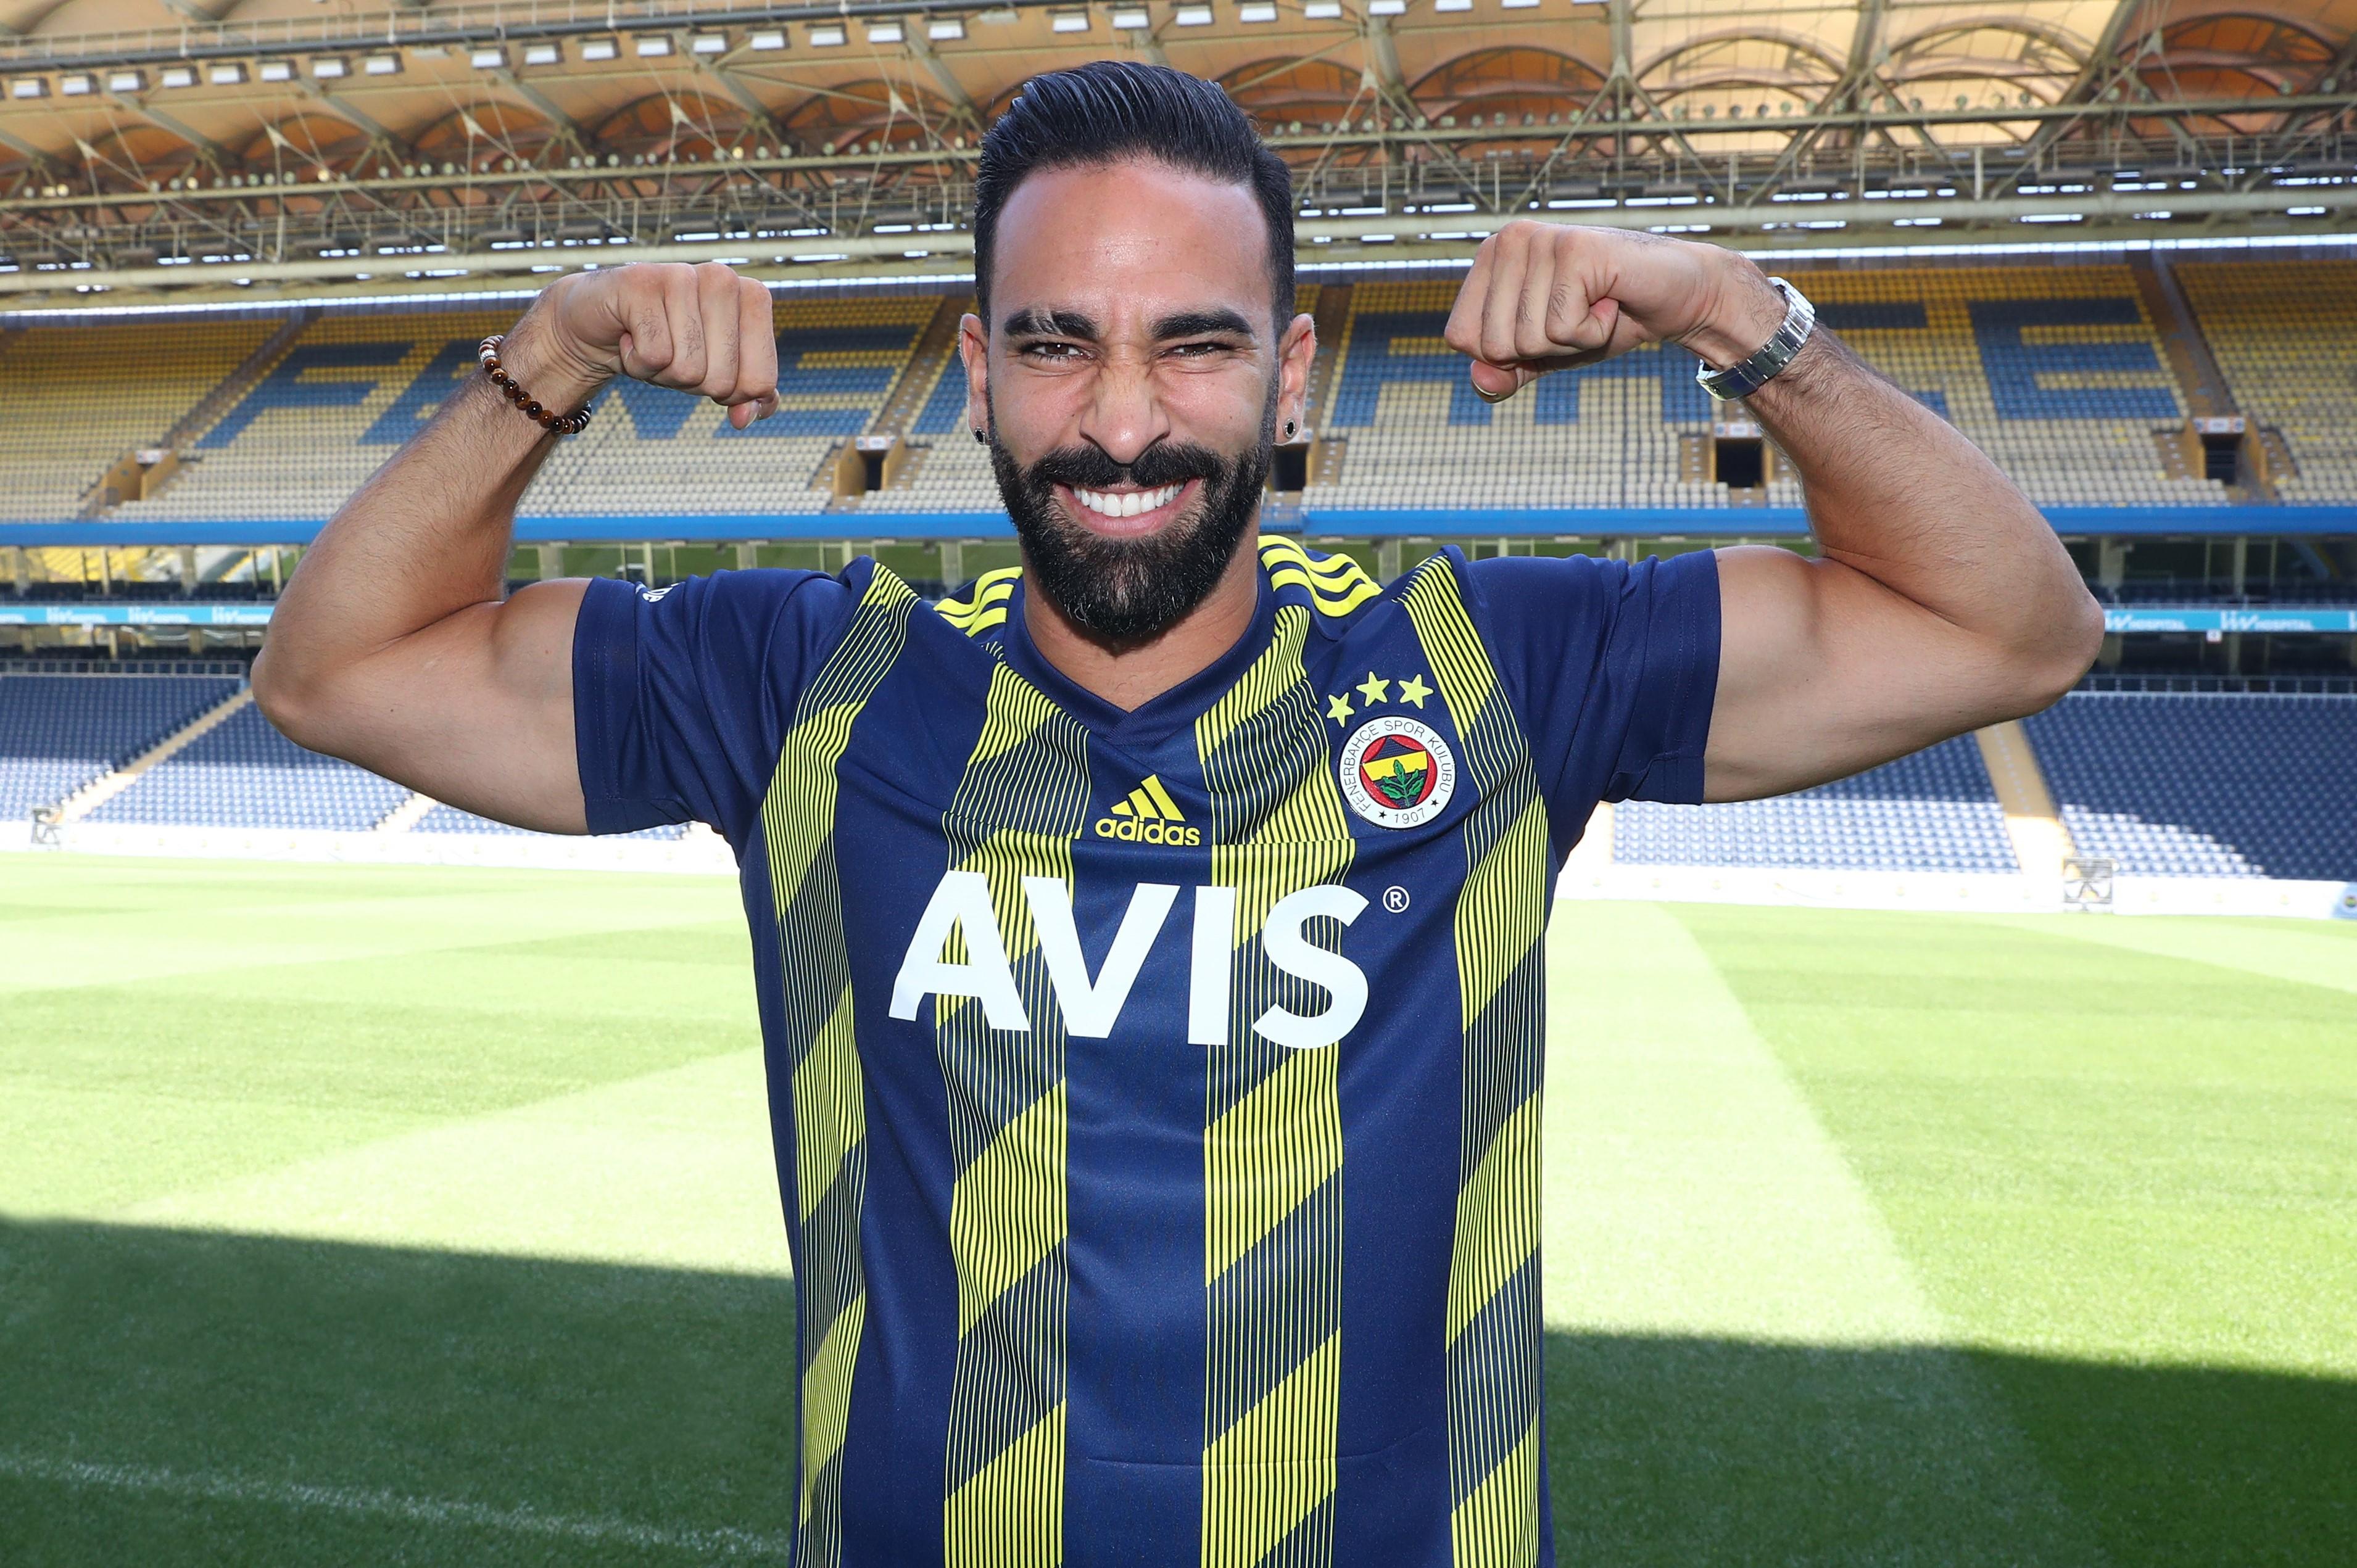 Football - Transferts - Licencié par l'OM, Adil Rami rebondit en Turquie